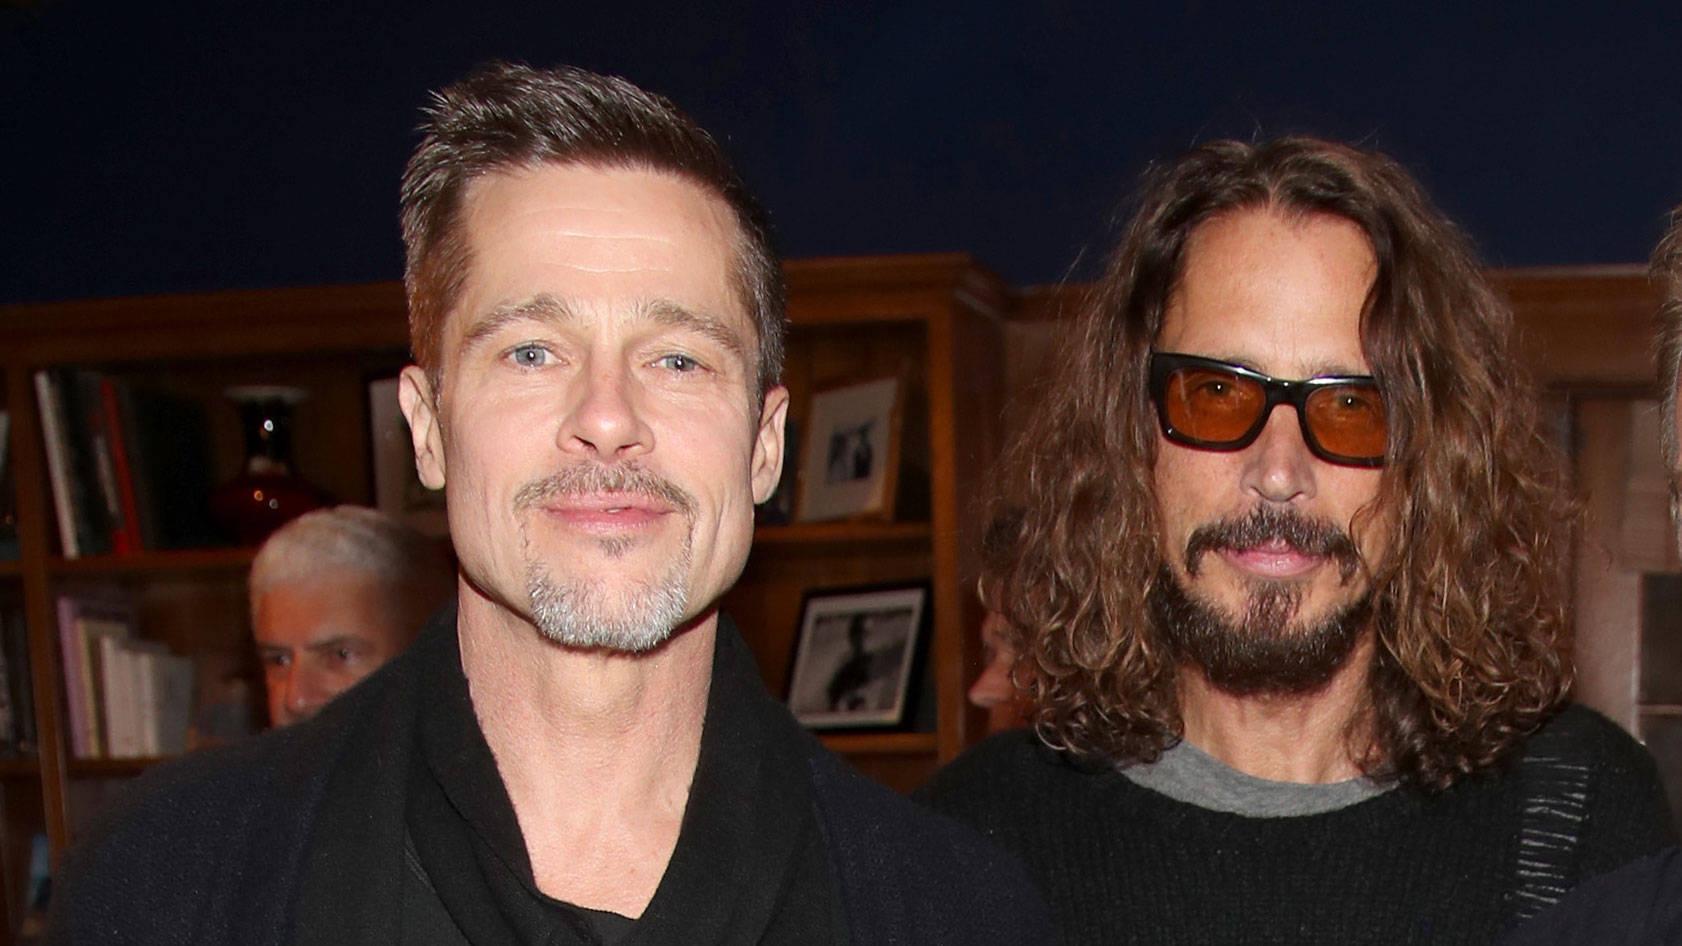 Details of Chris Cornell documentary produced by Brad Pitt revealed